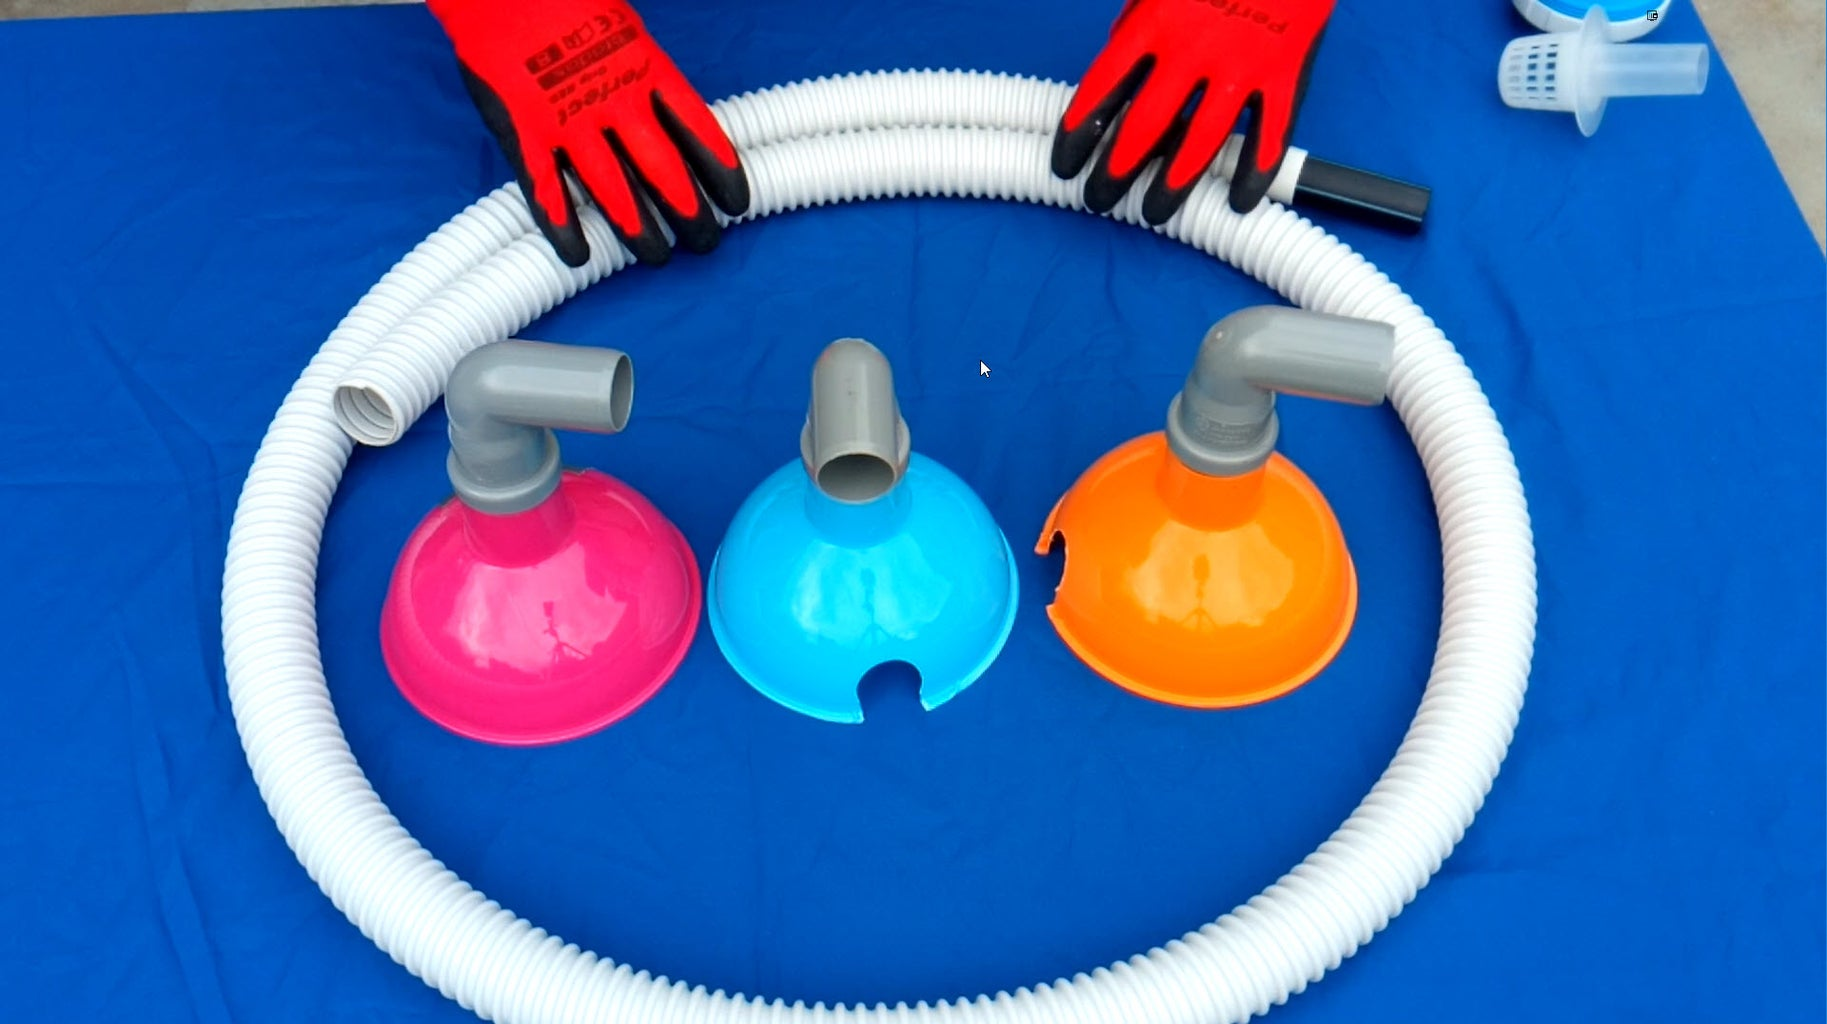 Pool Vacuum Cleaner Head - Like a Floor Drain